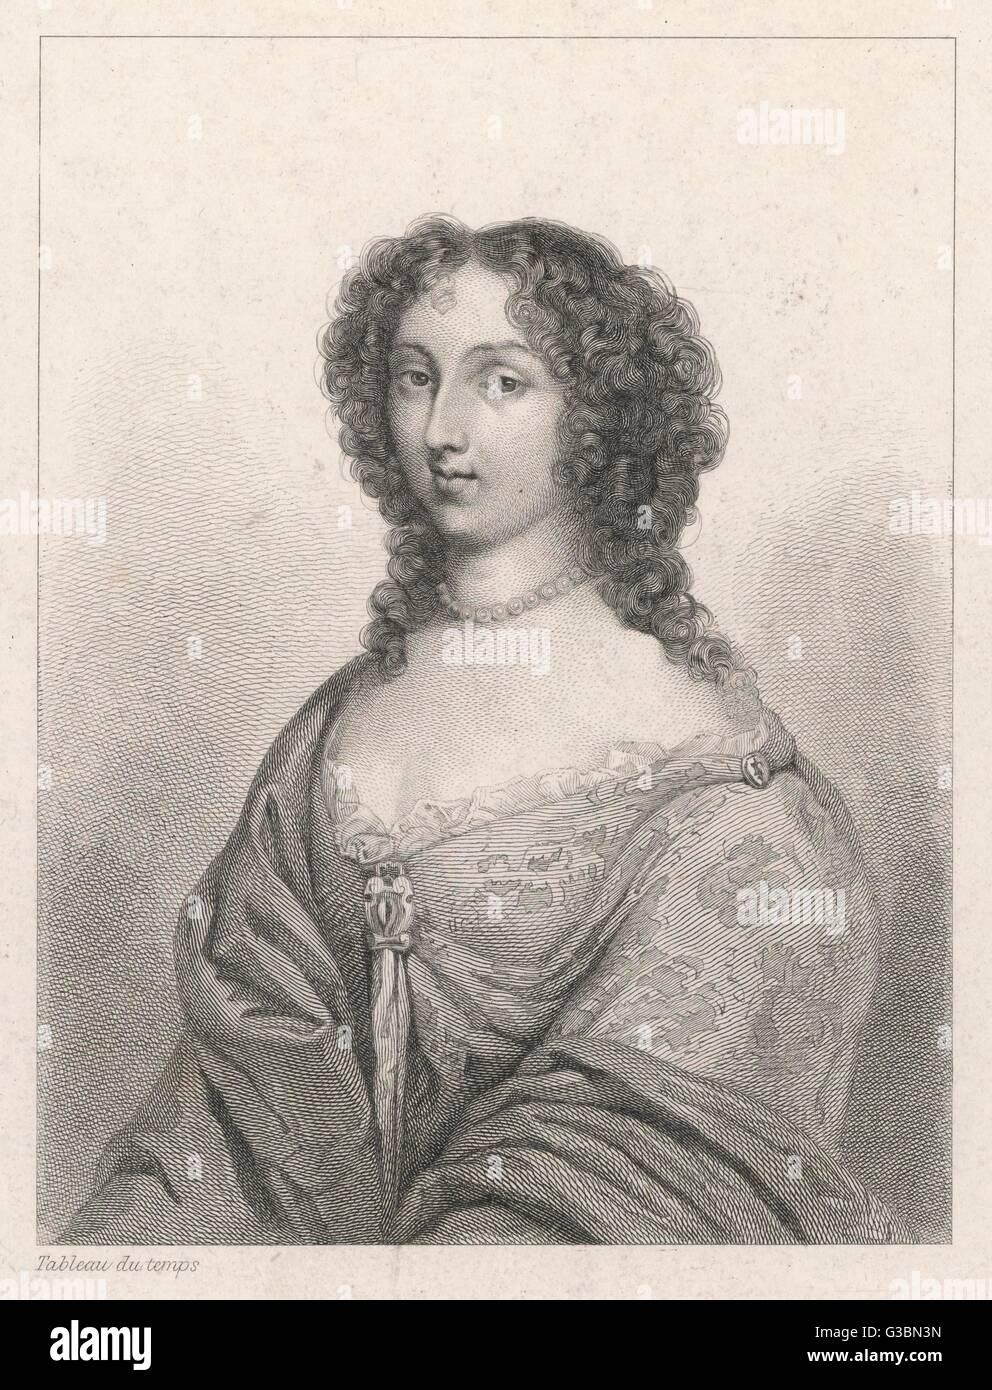 MARIE-CLAIRE de CREQUY,  comtesse de JARNAC         Date: ? - 1684 - Stock Image